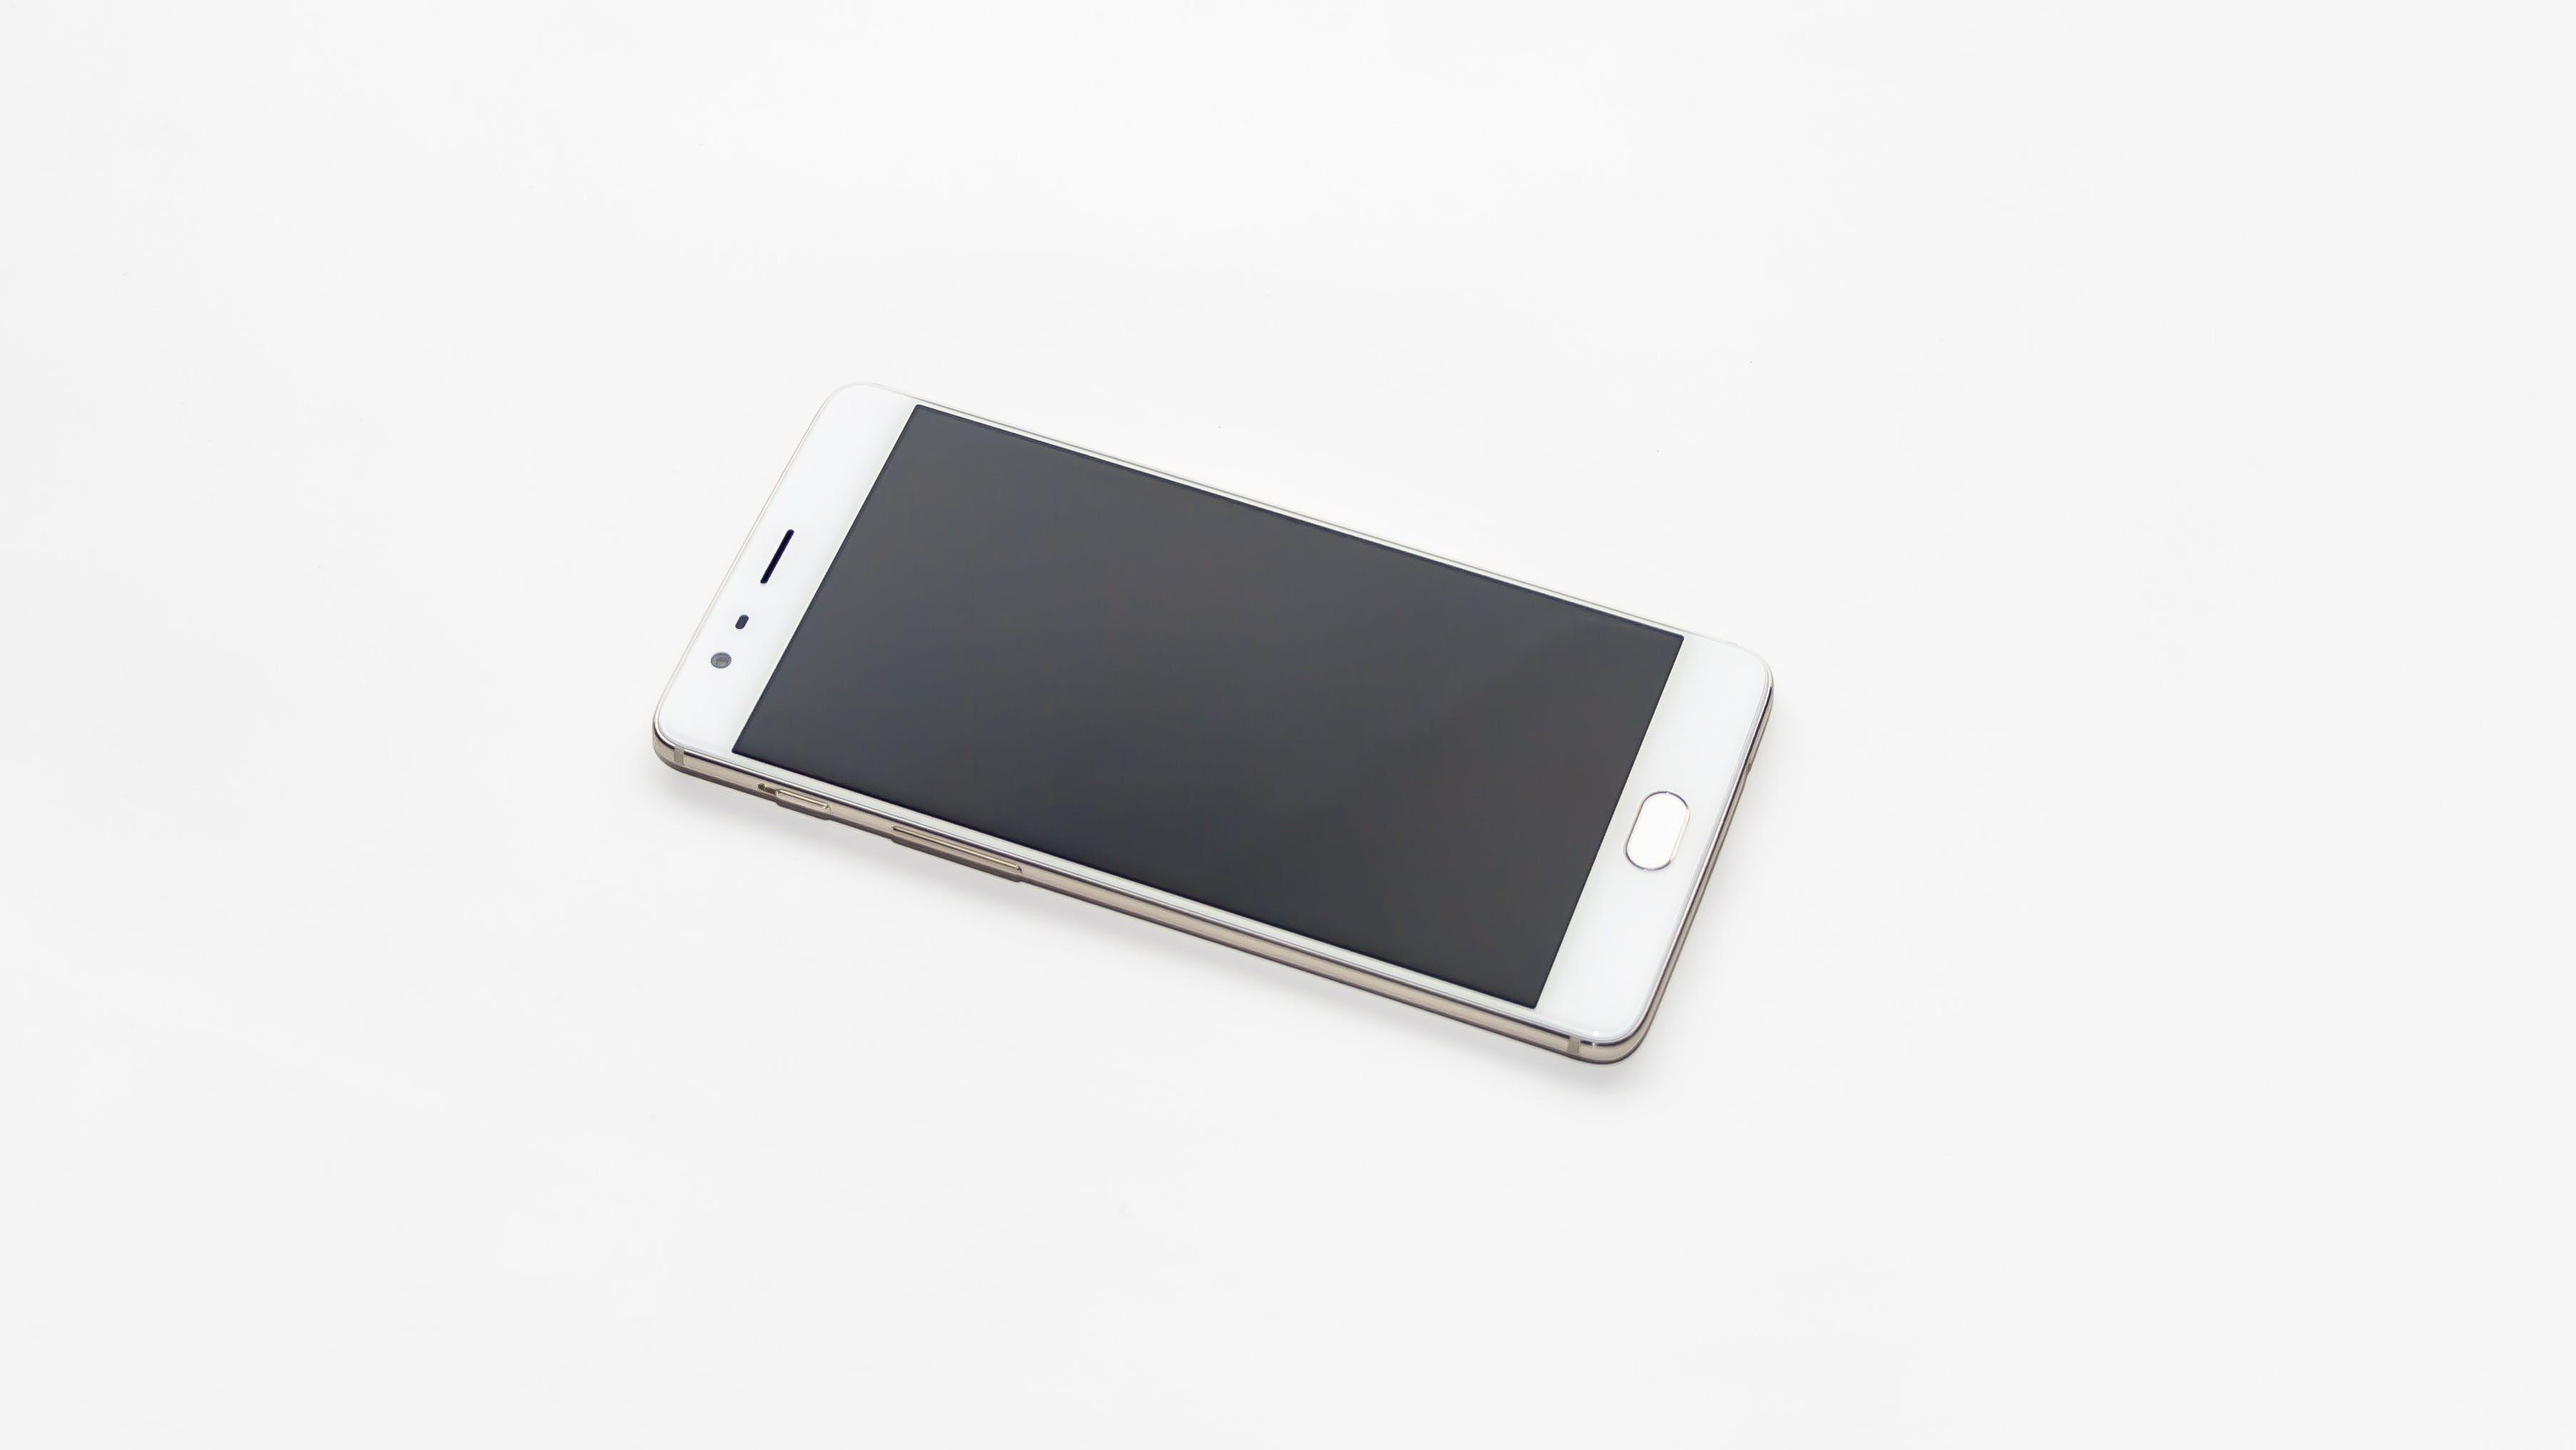 White Smartphone on Black Screen